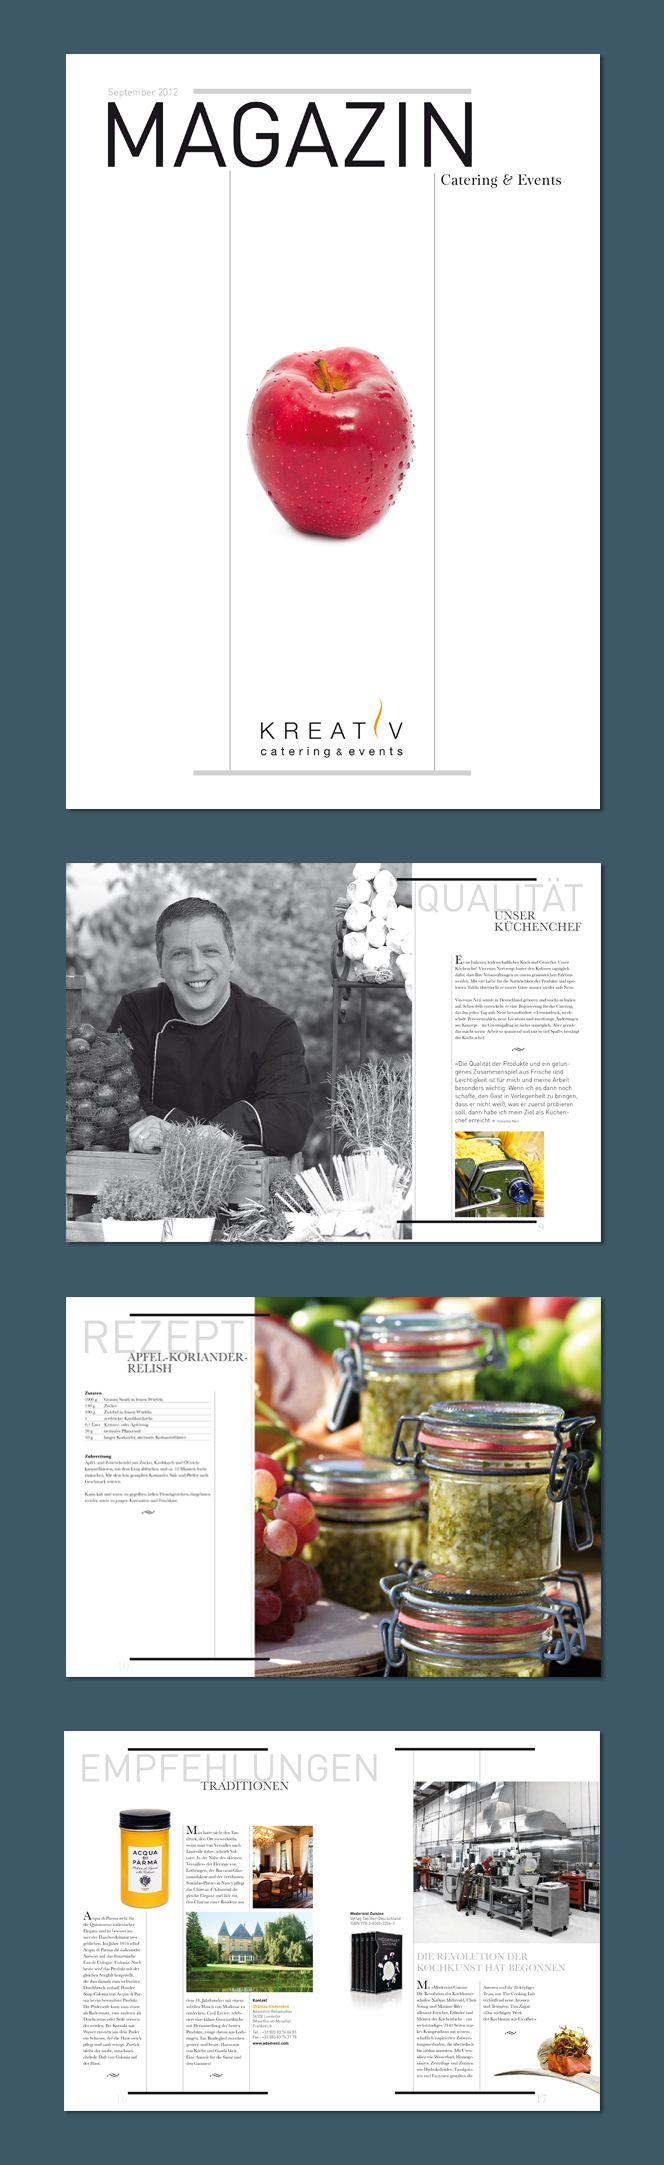 Kreativ Catering, Frankfurt a.M. – Kundenmagazin